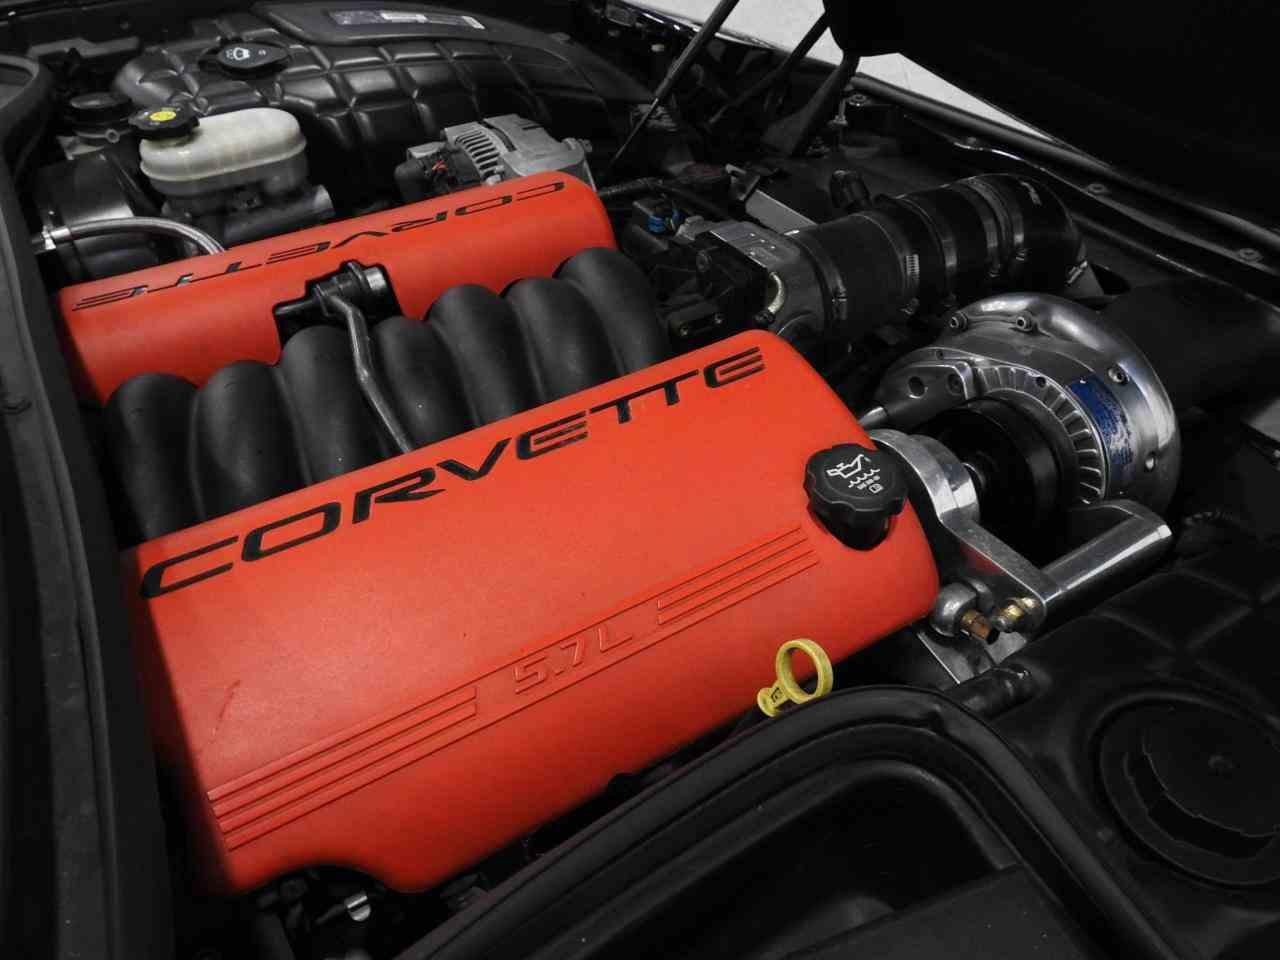 Large Picture of 2002 Chevrolet Corvette located in Kenosha Wisconsin - $31,595.00 - KE5O